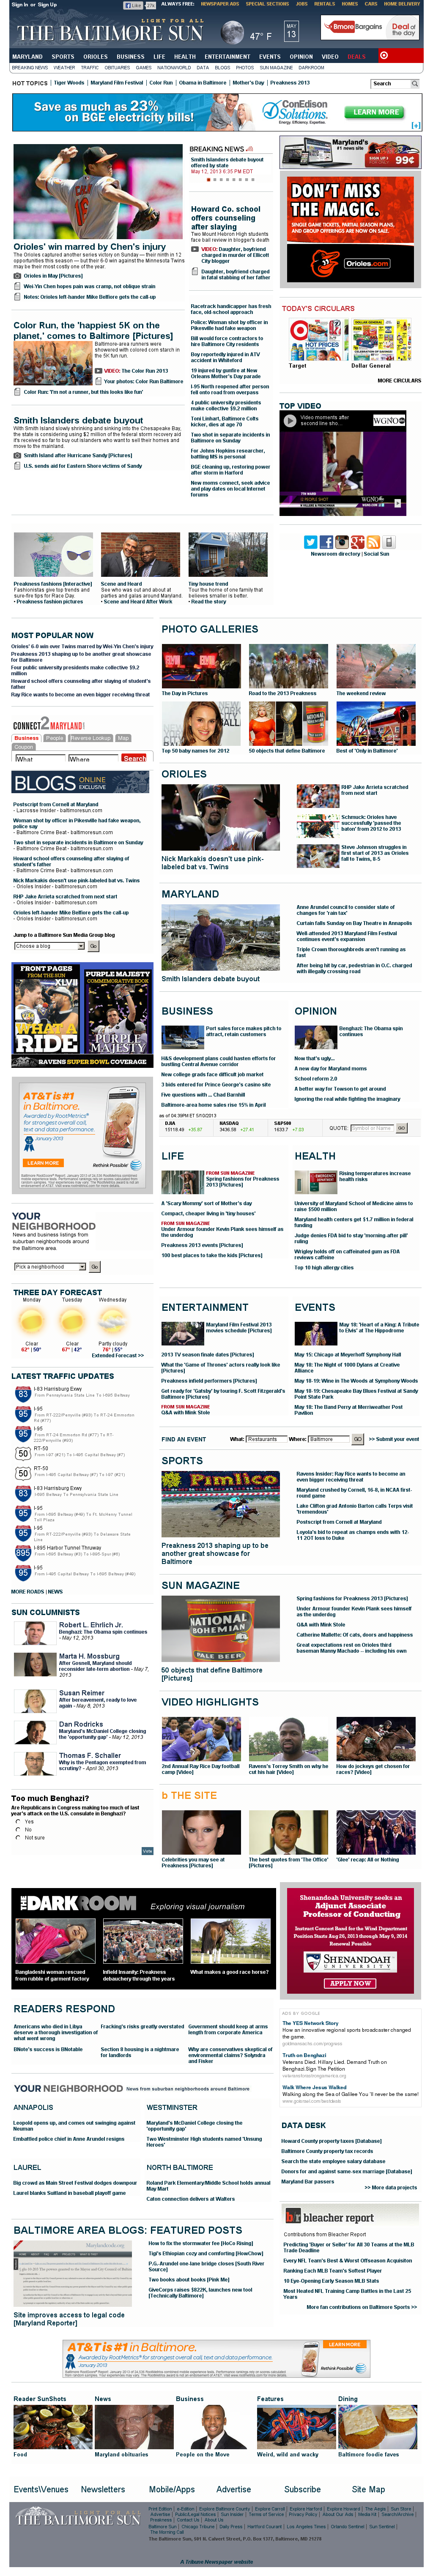 The Baltimore Sun at Monday May 13, 2013, 6:01 a.m. UTC